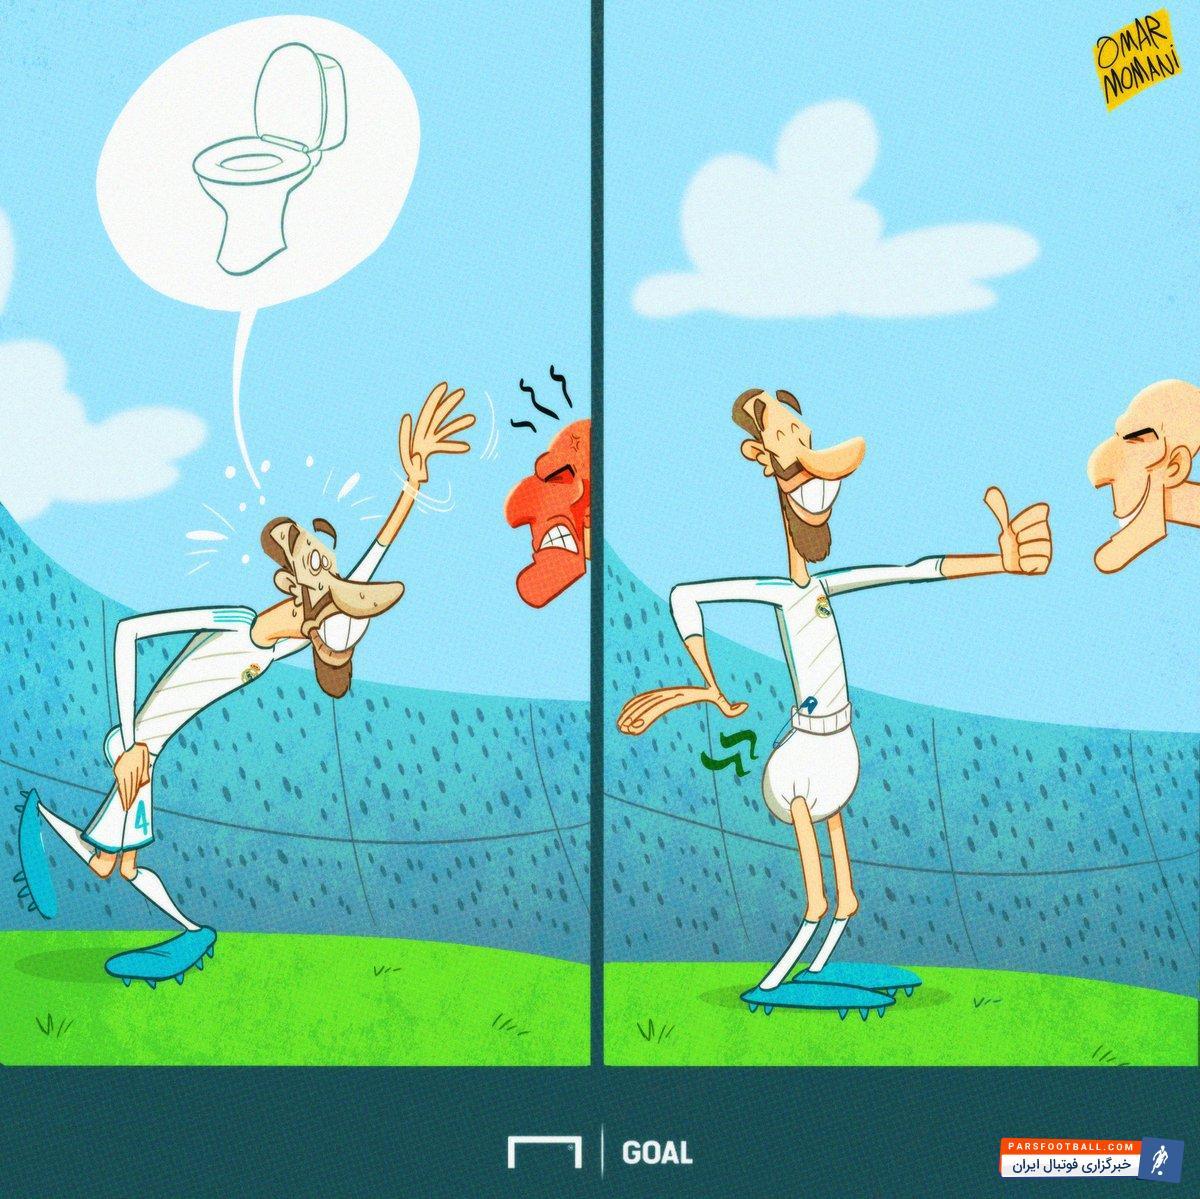 عکس ؛ کاریکاتور ؛ حرکت عجیب کاپیتان رئال مادرید سوژه شد